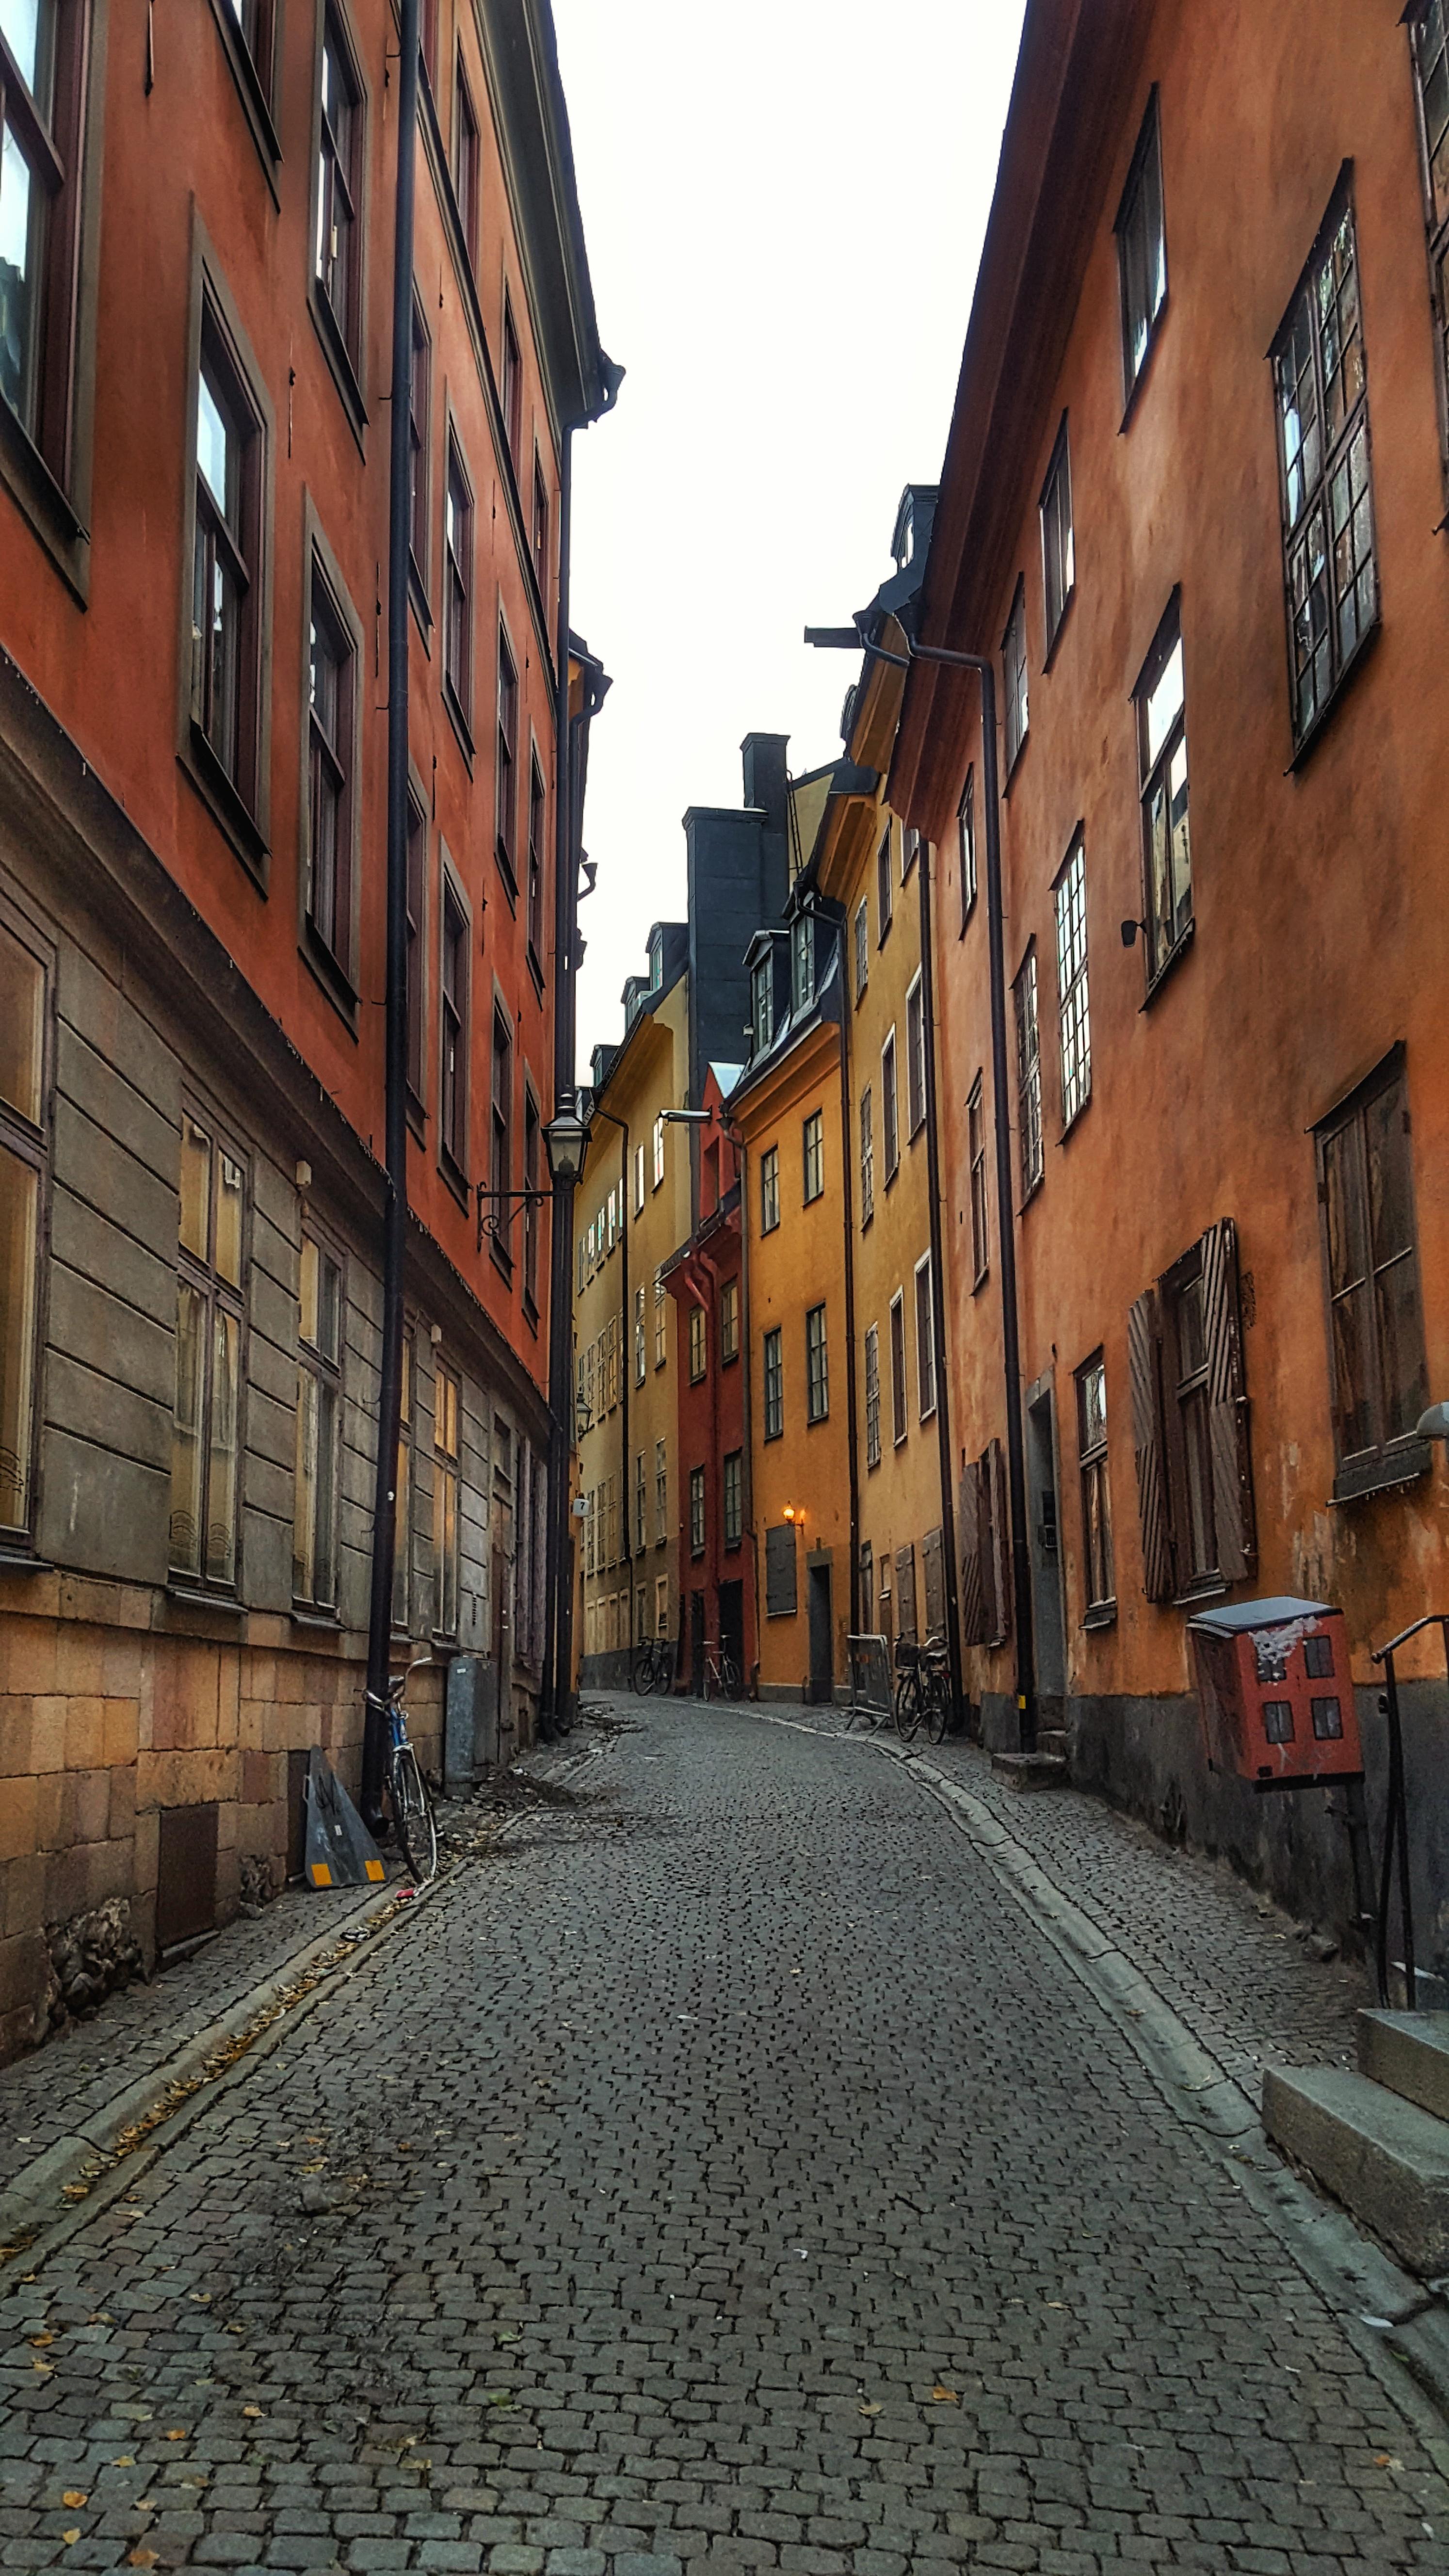 Street in Gamla Stan (Old Town), Stockholm